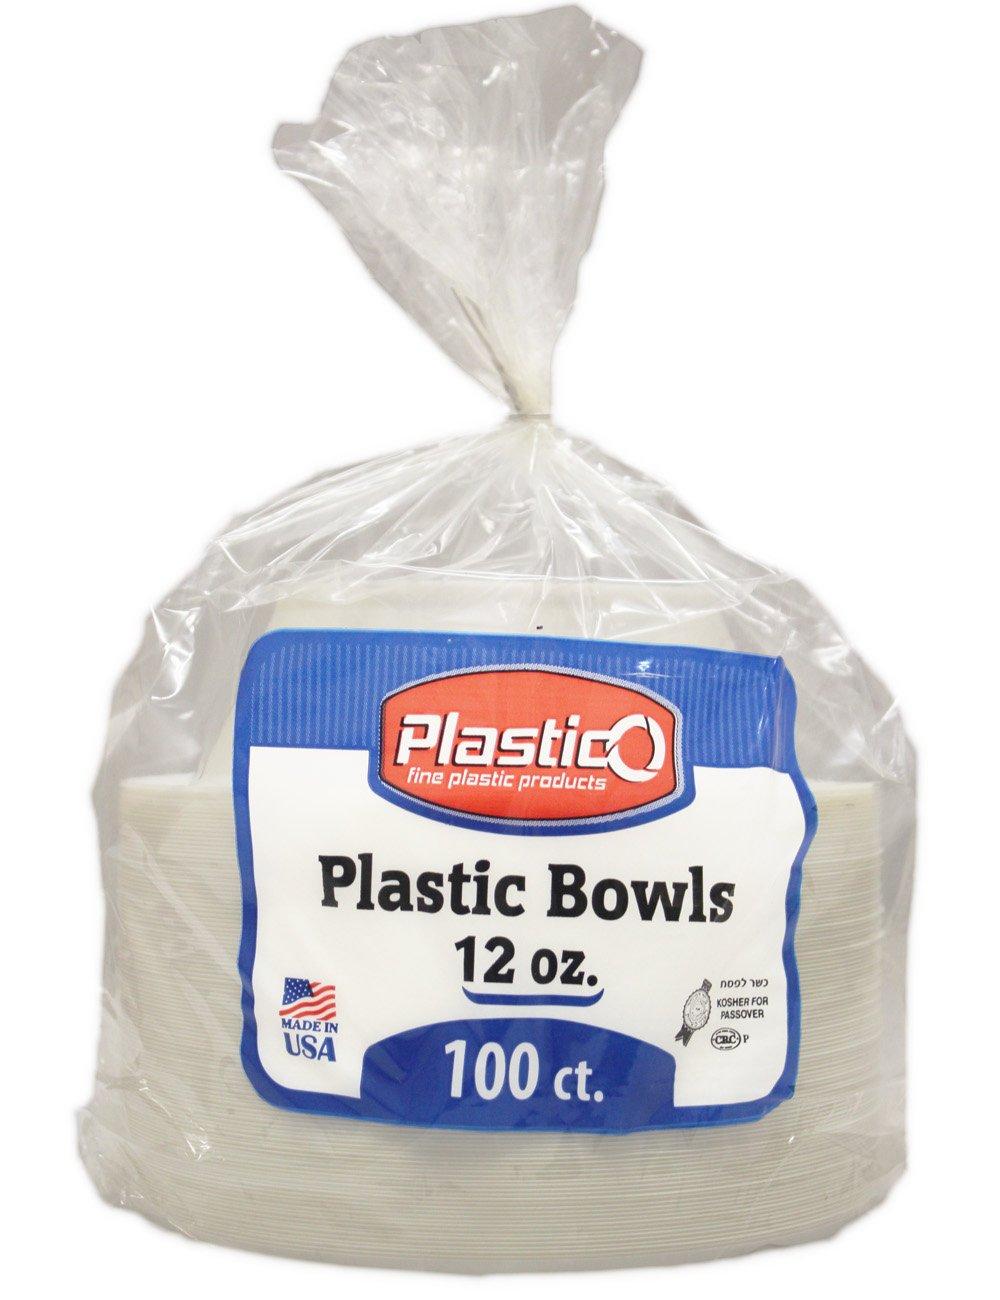 100 X White Plastic 12oz Disposable Bowls by Plastico